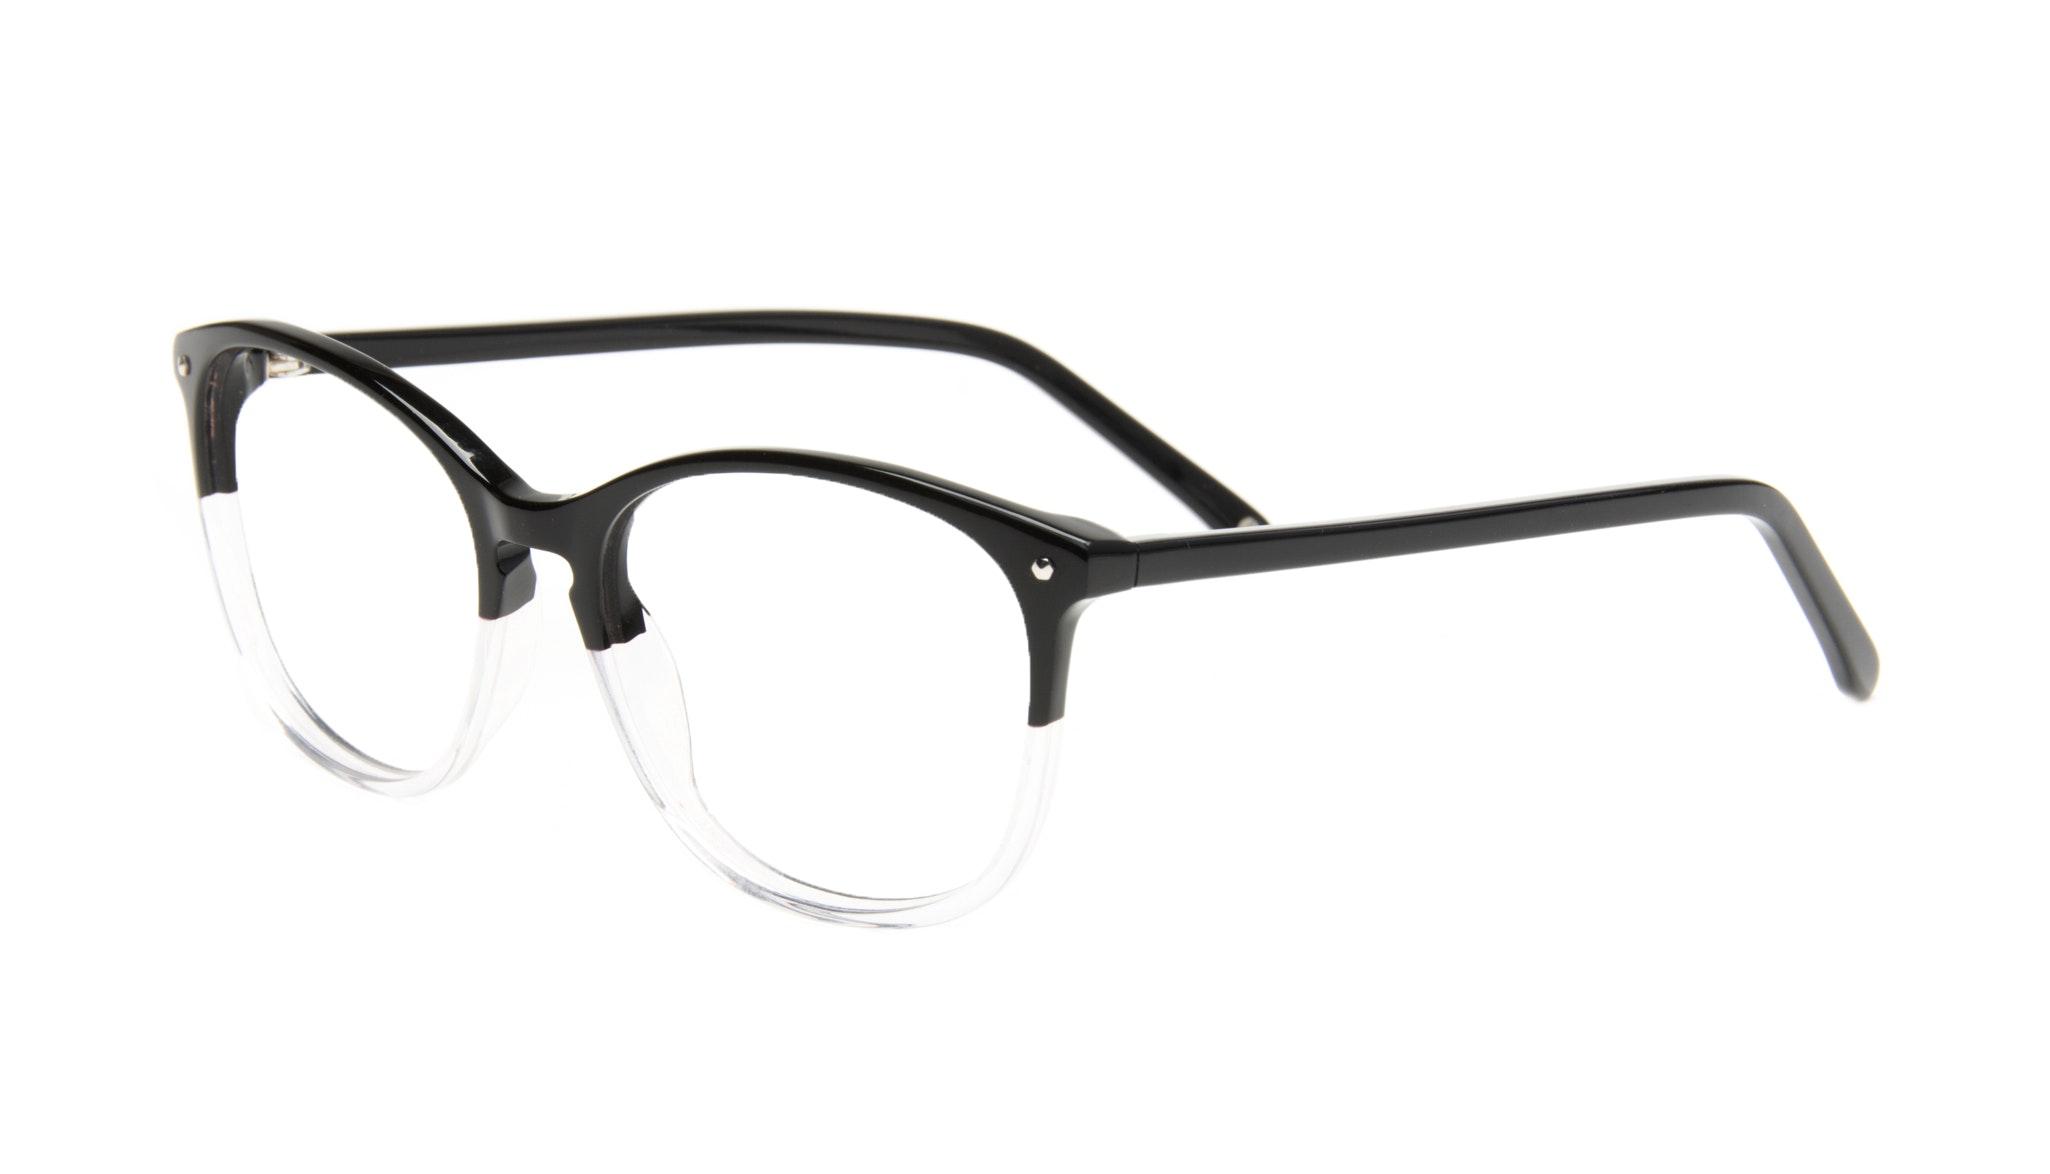 Affordable Fashion Glasses Rectangle Square Round Eyeglasses Women Nadine Two Tone Black Tilt